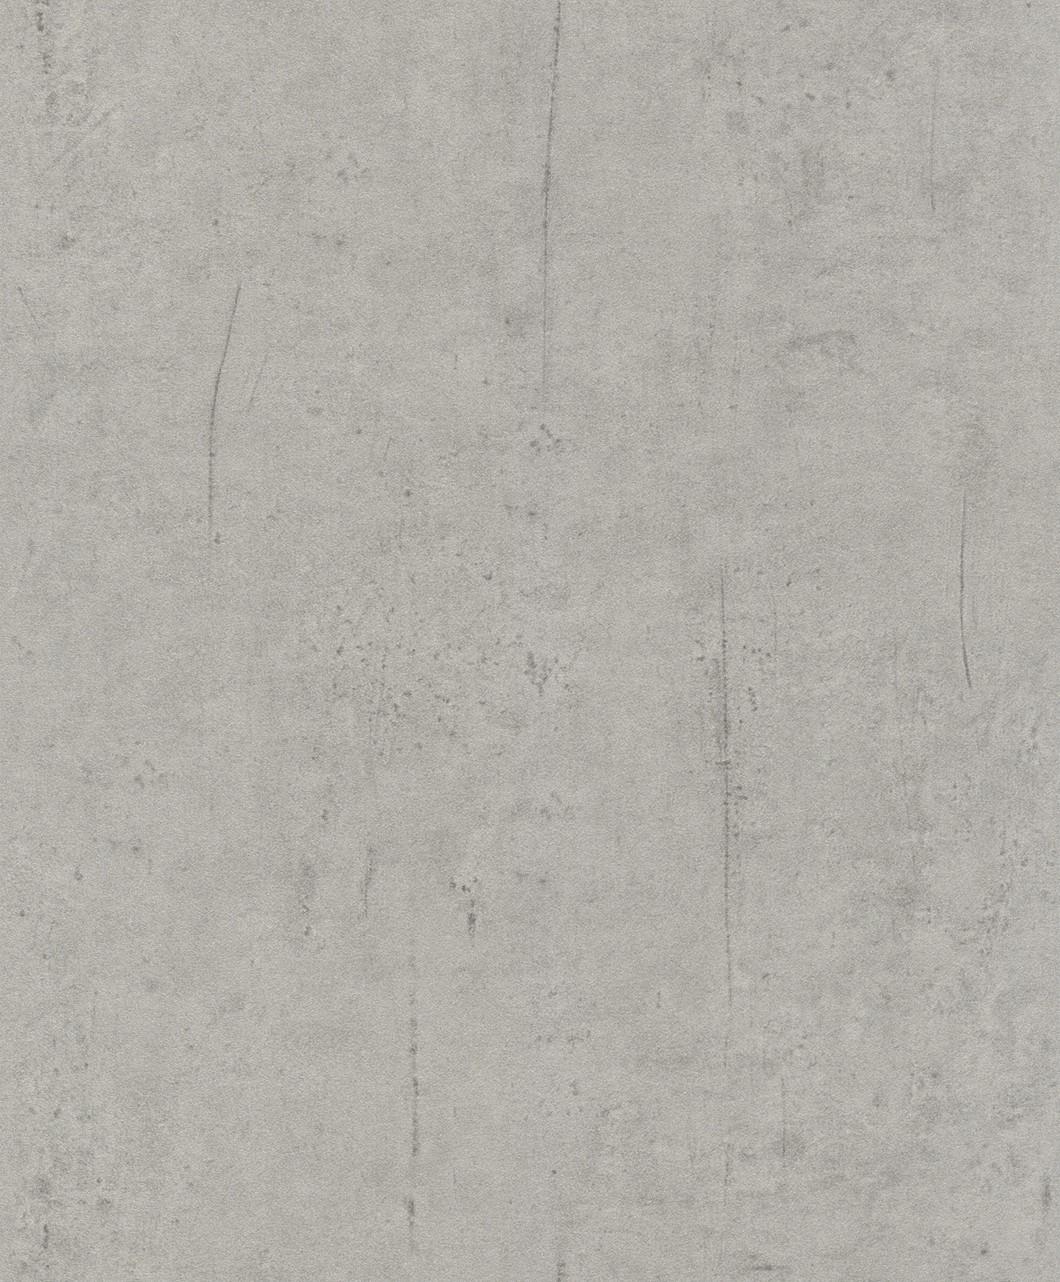 vliestapete beton beton optik stein rasch grau 475302. Black Bedroom Furniture Sets. Home Design Ideas